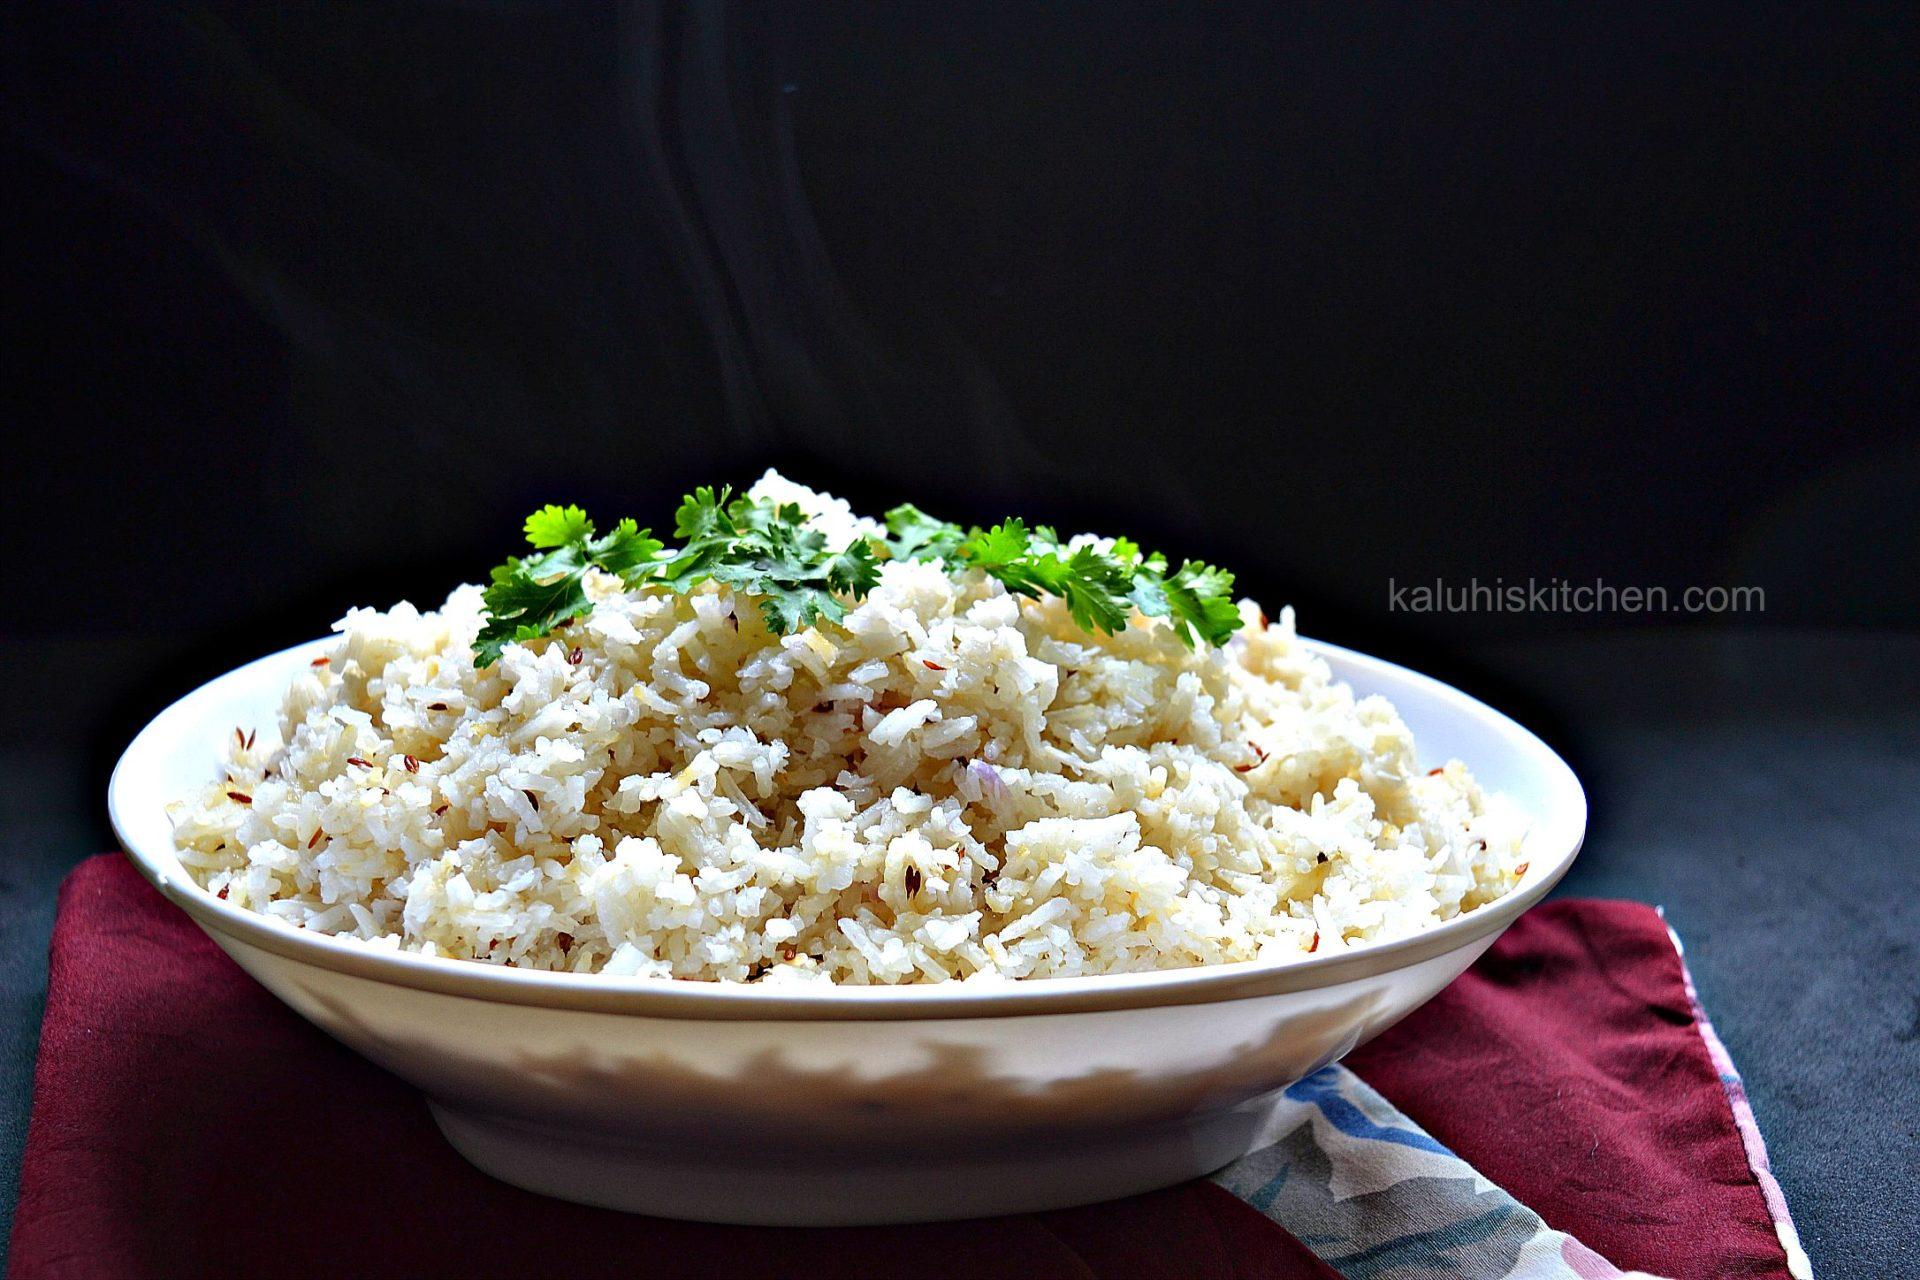 kenynan food_wali wa nazi with whole cumin seeds_coconut rice_kaluhiskitchen.com